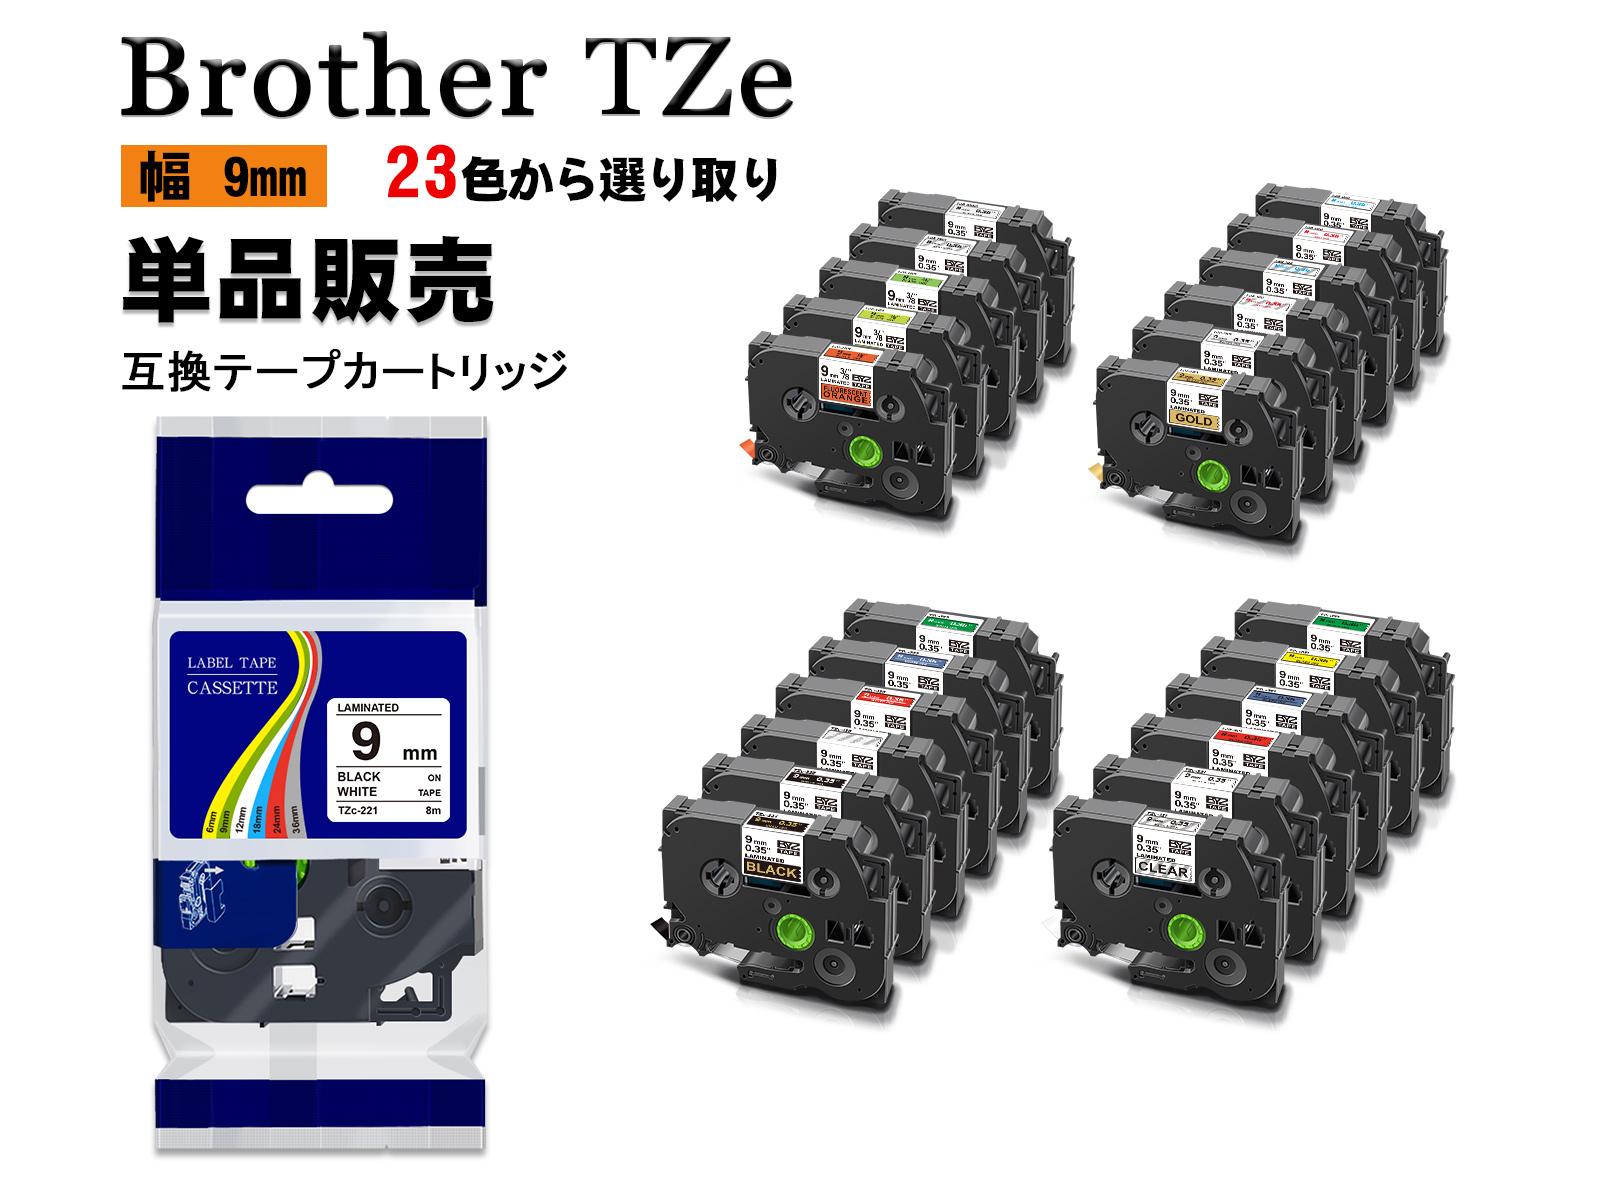 TZeテープ TZeシリーズ お名前シール ブランド激安セール会場 幅 9mm 全 7色 名前シール Brother ブラザー 1個 マイラベル 長さ 2年保証可能 セール 8m テプラテープ 23色 ピータッチキューブ用 互換